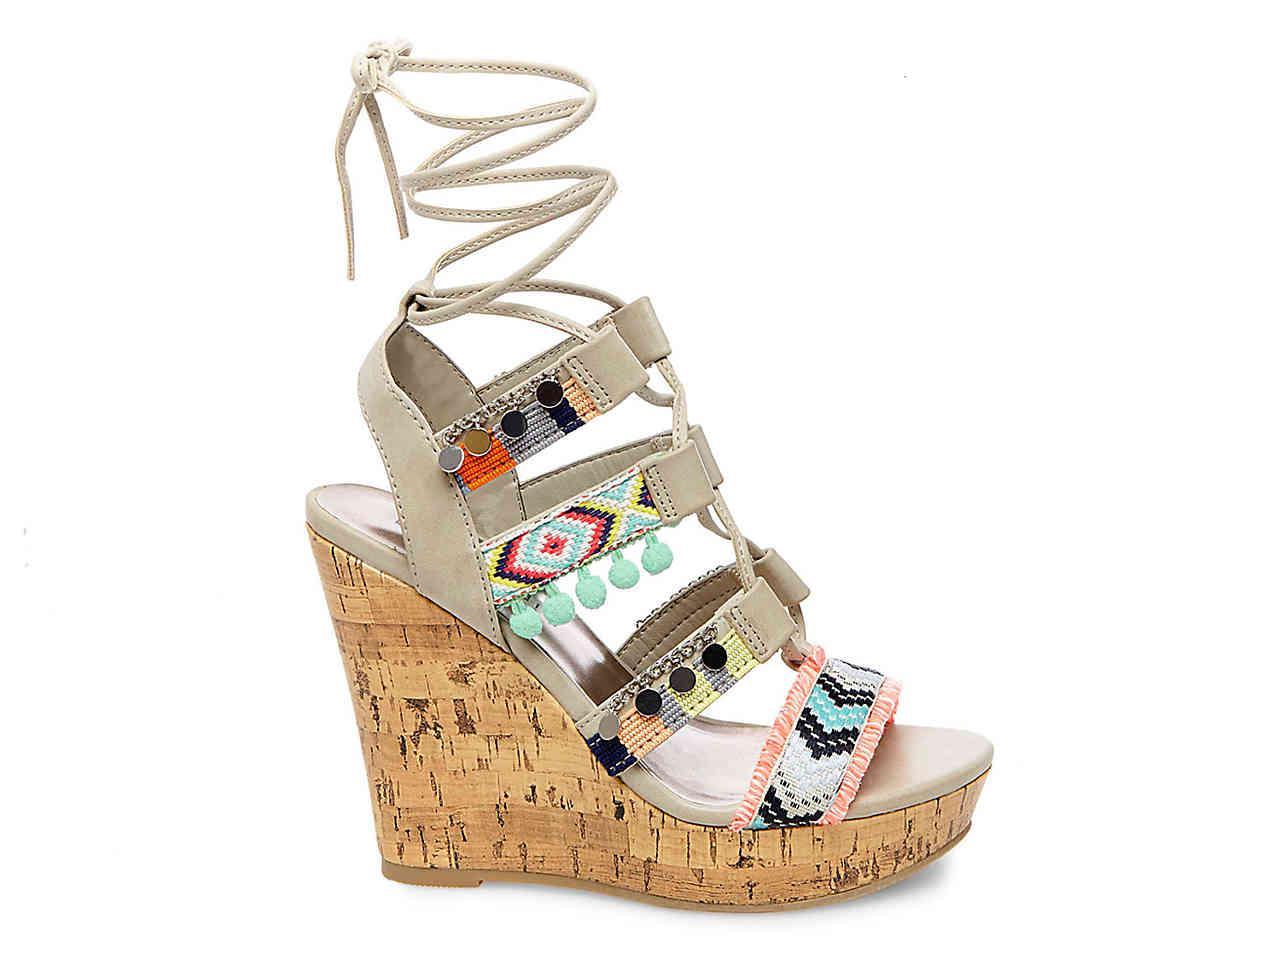 Madden Girl Indie Wedge Sandal - Lyst